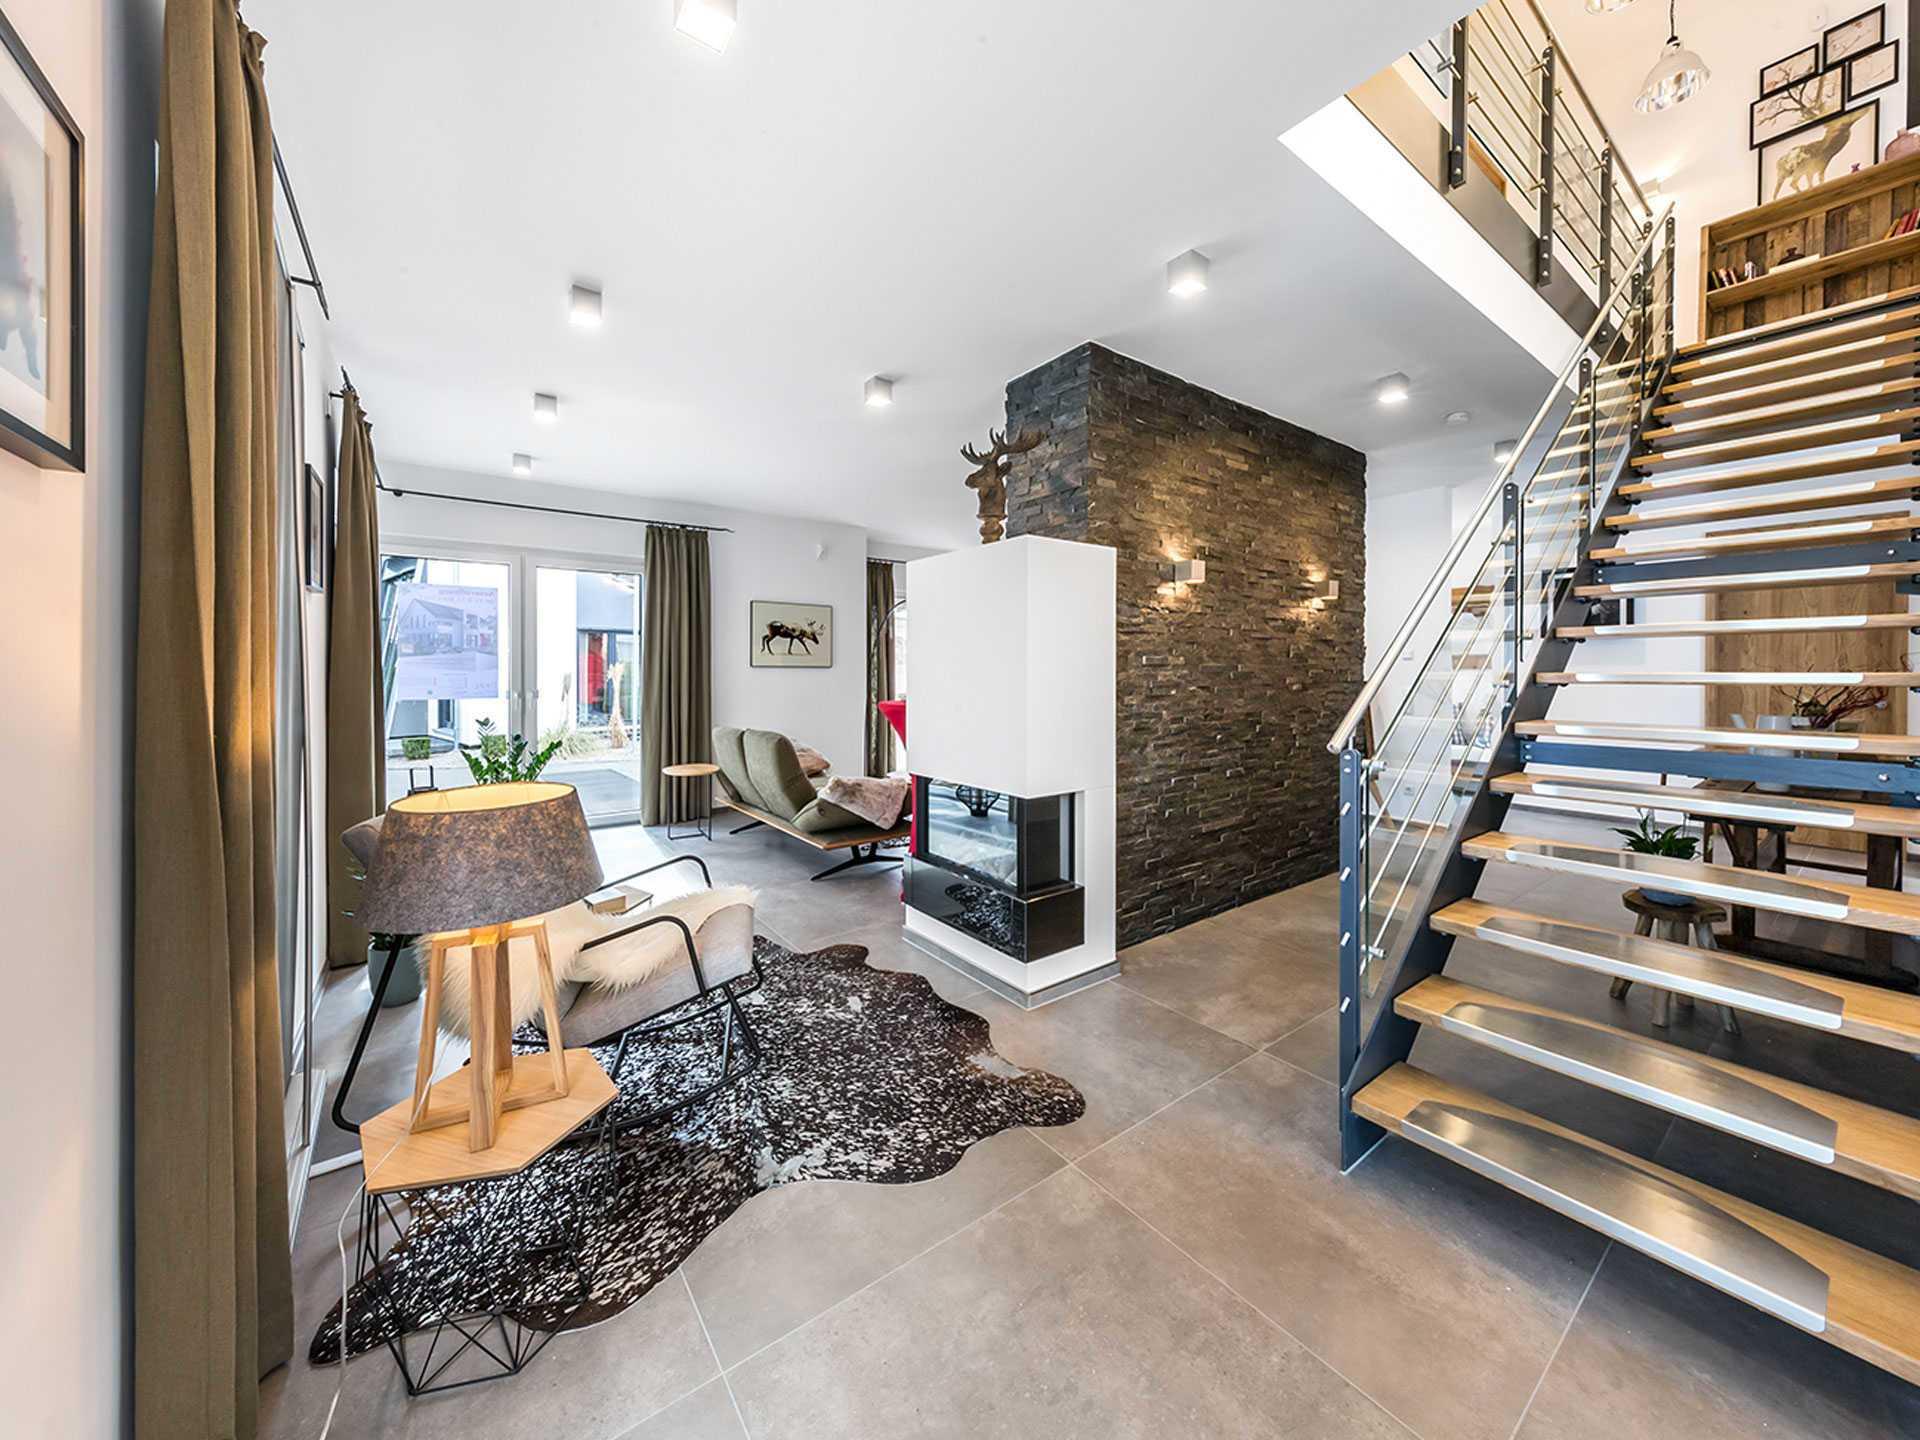 Musterhaus Fellbach mit Zwerchgiebel und Balkon  OKAL Haus  Musterhausnet